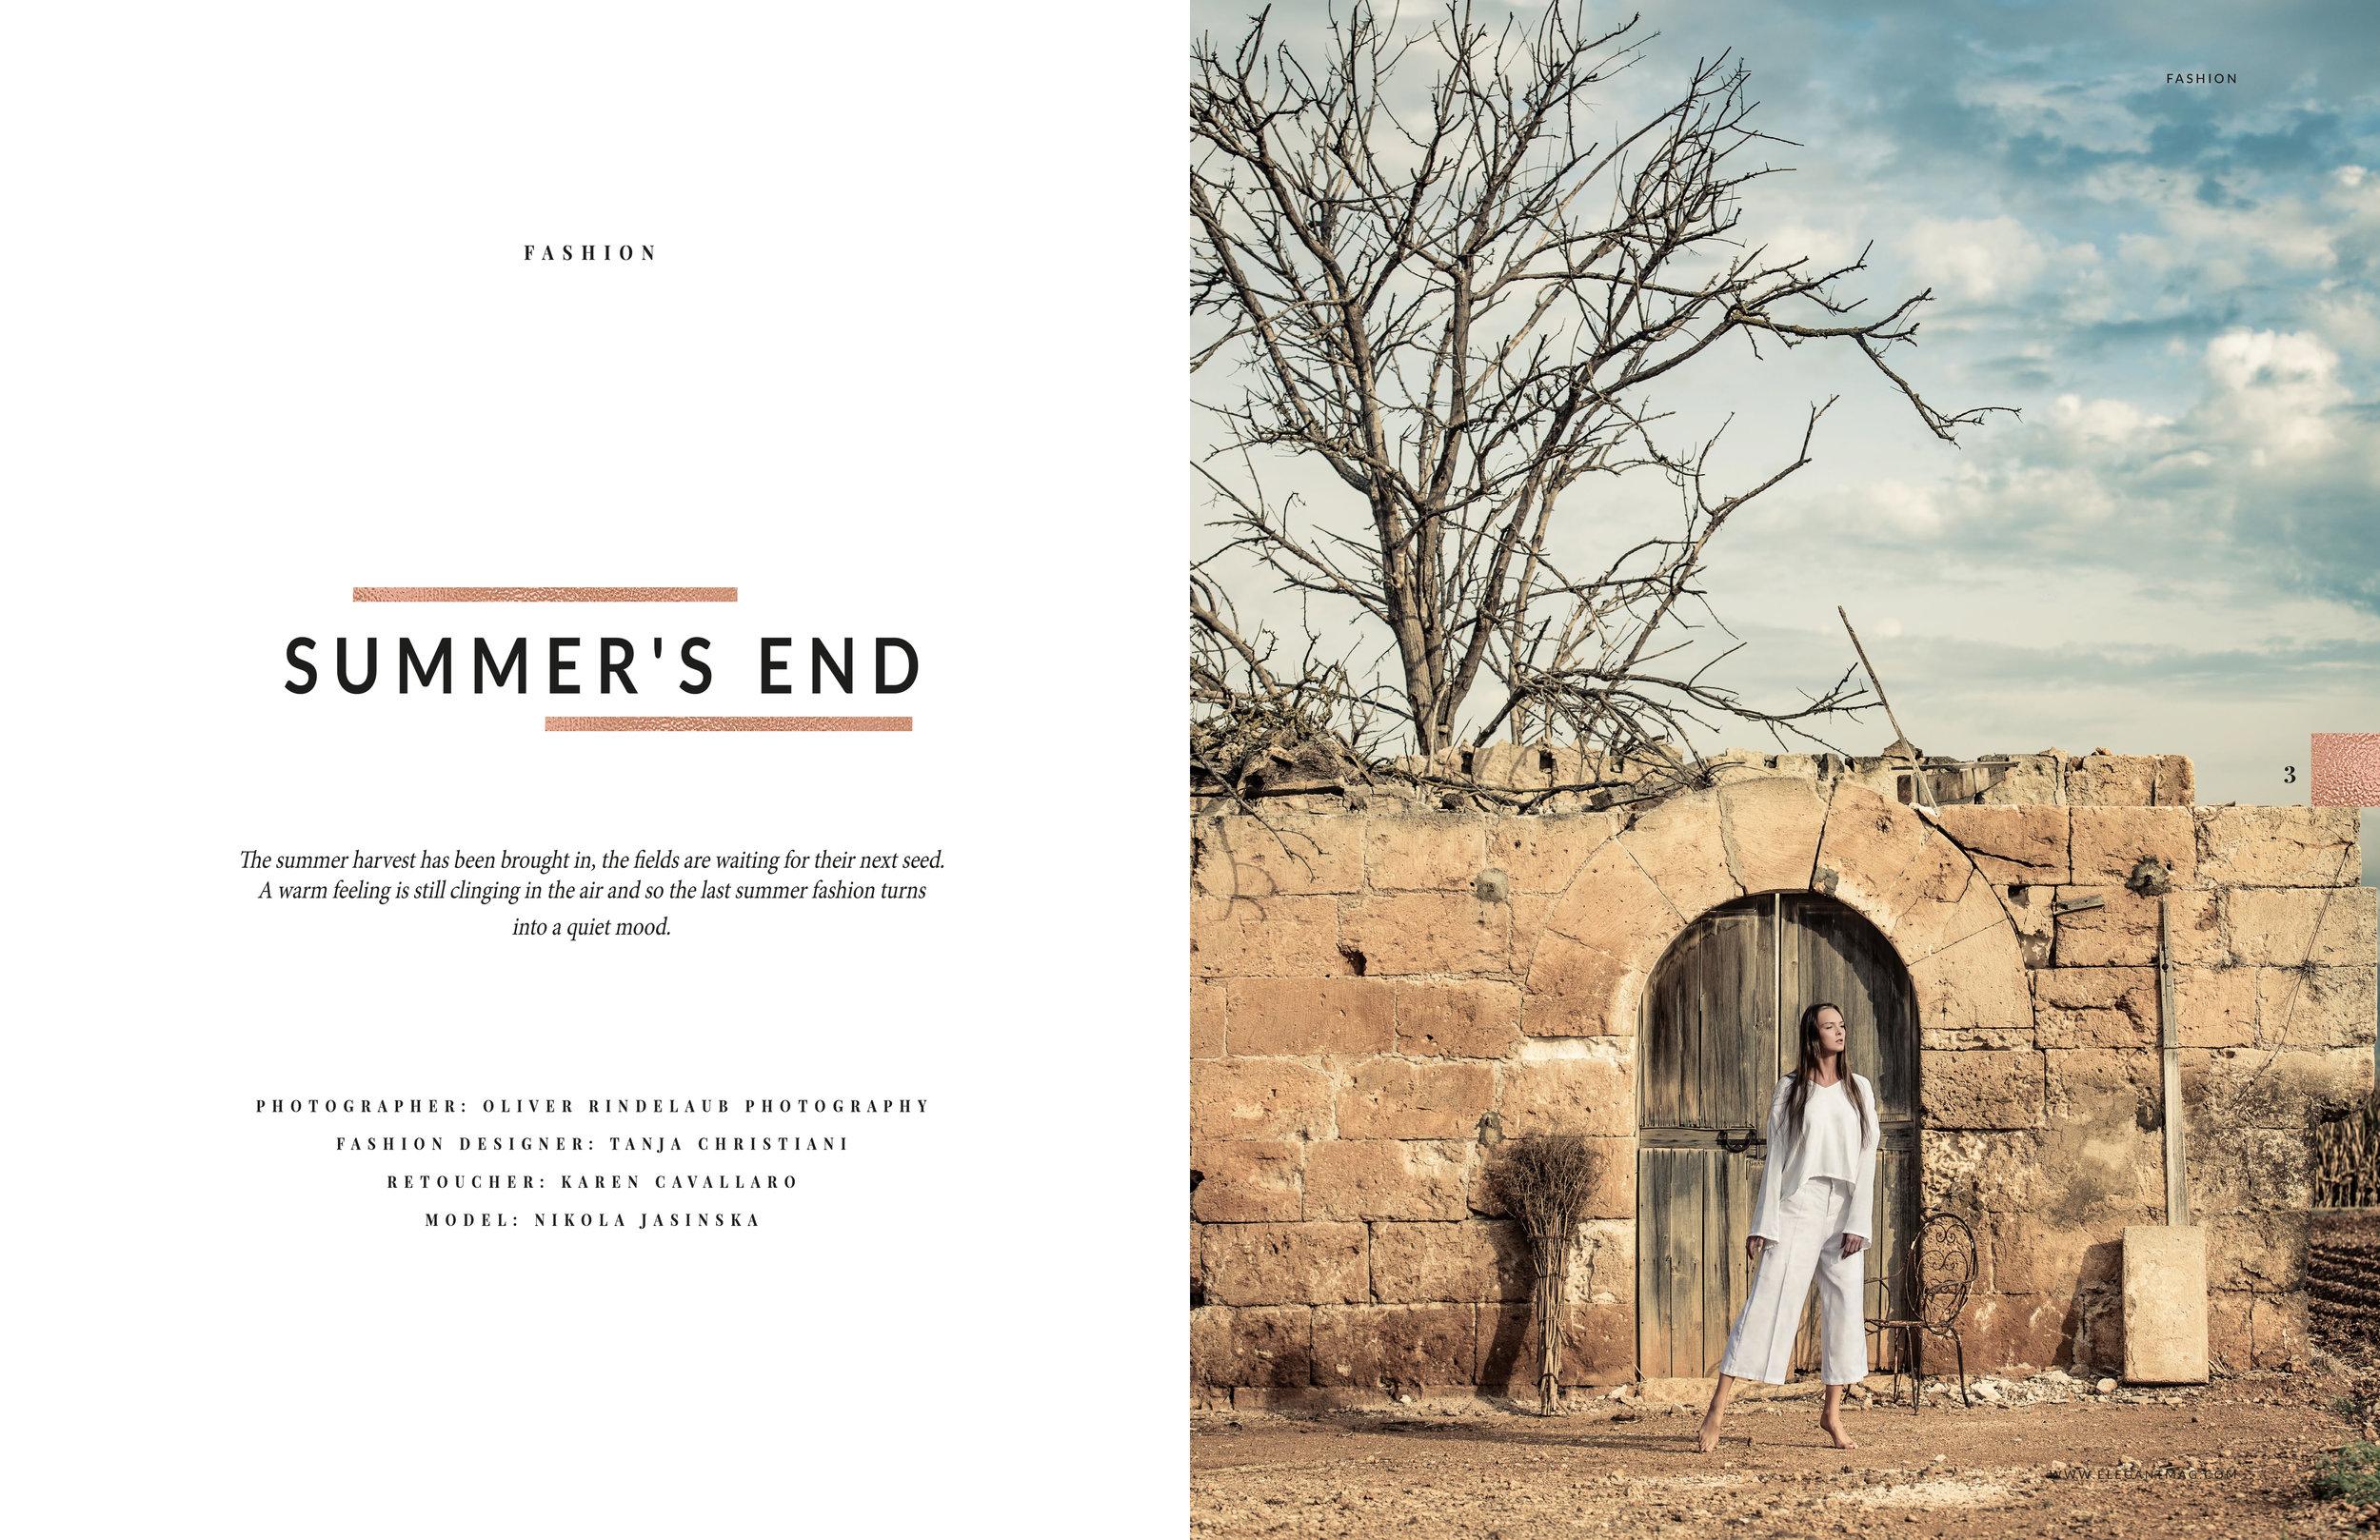 Photography -  Oliver Rindelaub  Model -  Nikola Jasinska  Retoucher - Karen Cavallaro October Issue of  ELEGANT MAGAZINE